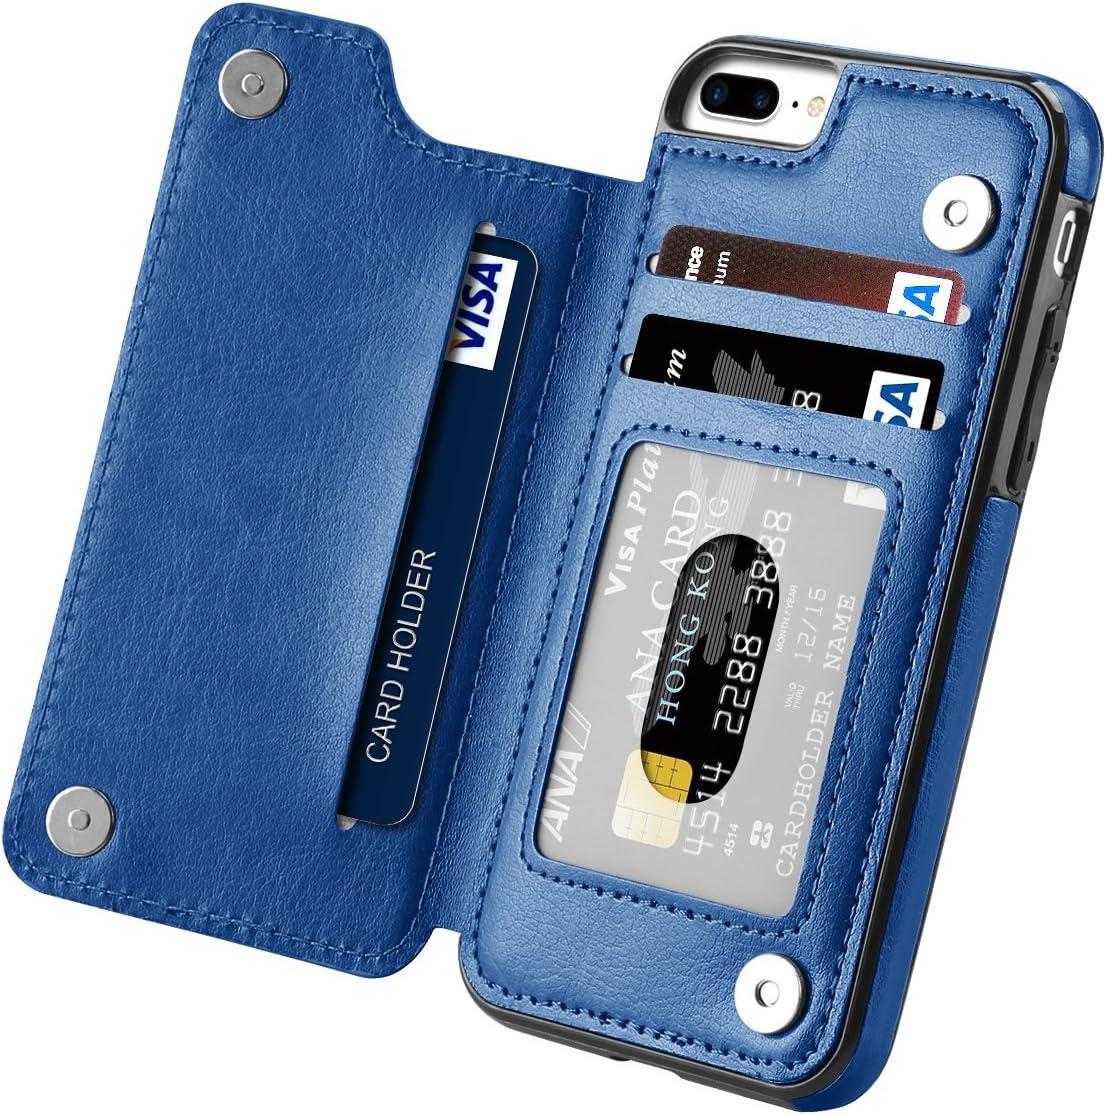 iPhone 7 Plus Case, iPhone 8 Plus Case, Hoofur Slim Fit Premium Leather Wallet Casae Card Slots Shockproof Folio Flip Protective Defender Shell for Apple iPhone 7 Plus (5.5 Inch) (Blue)